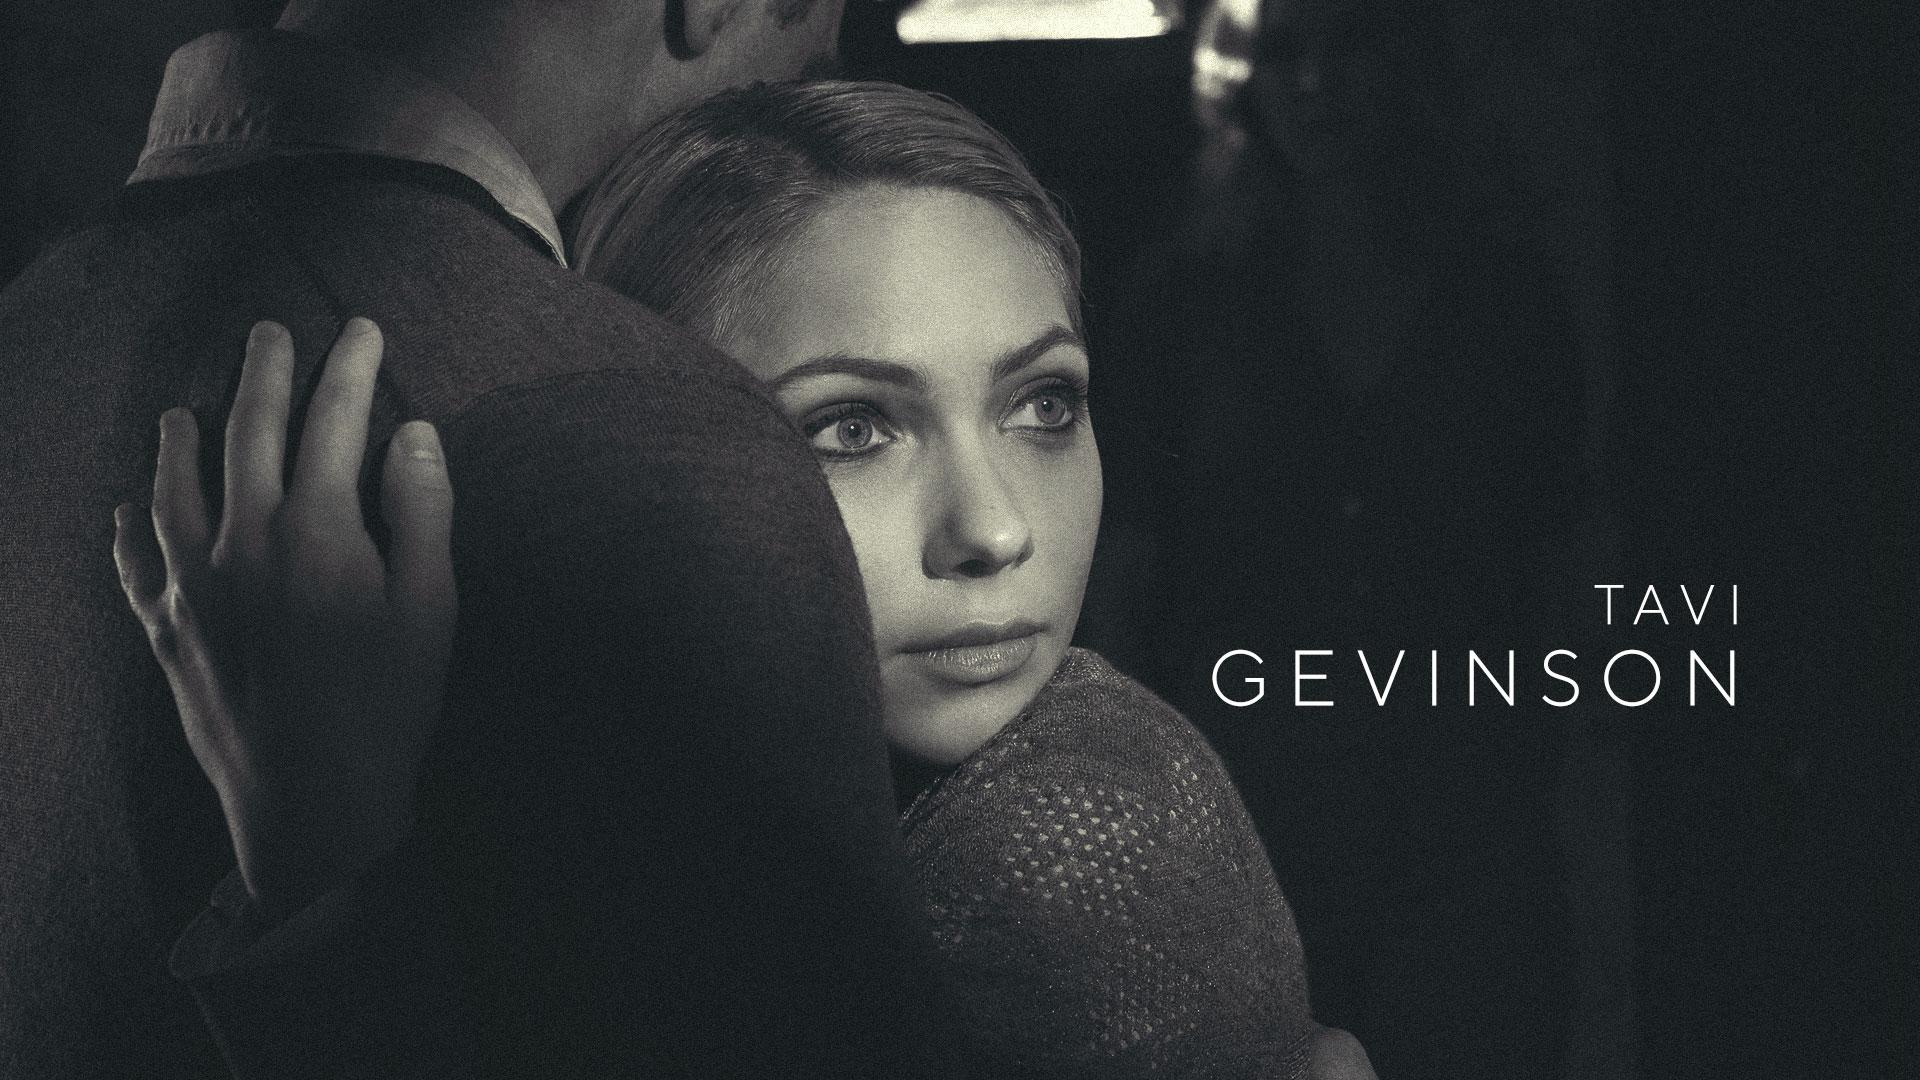 Tavi Gevinson as Maggie in